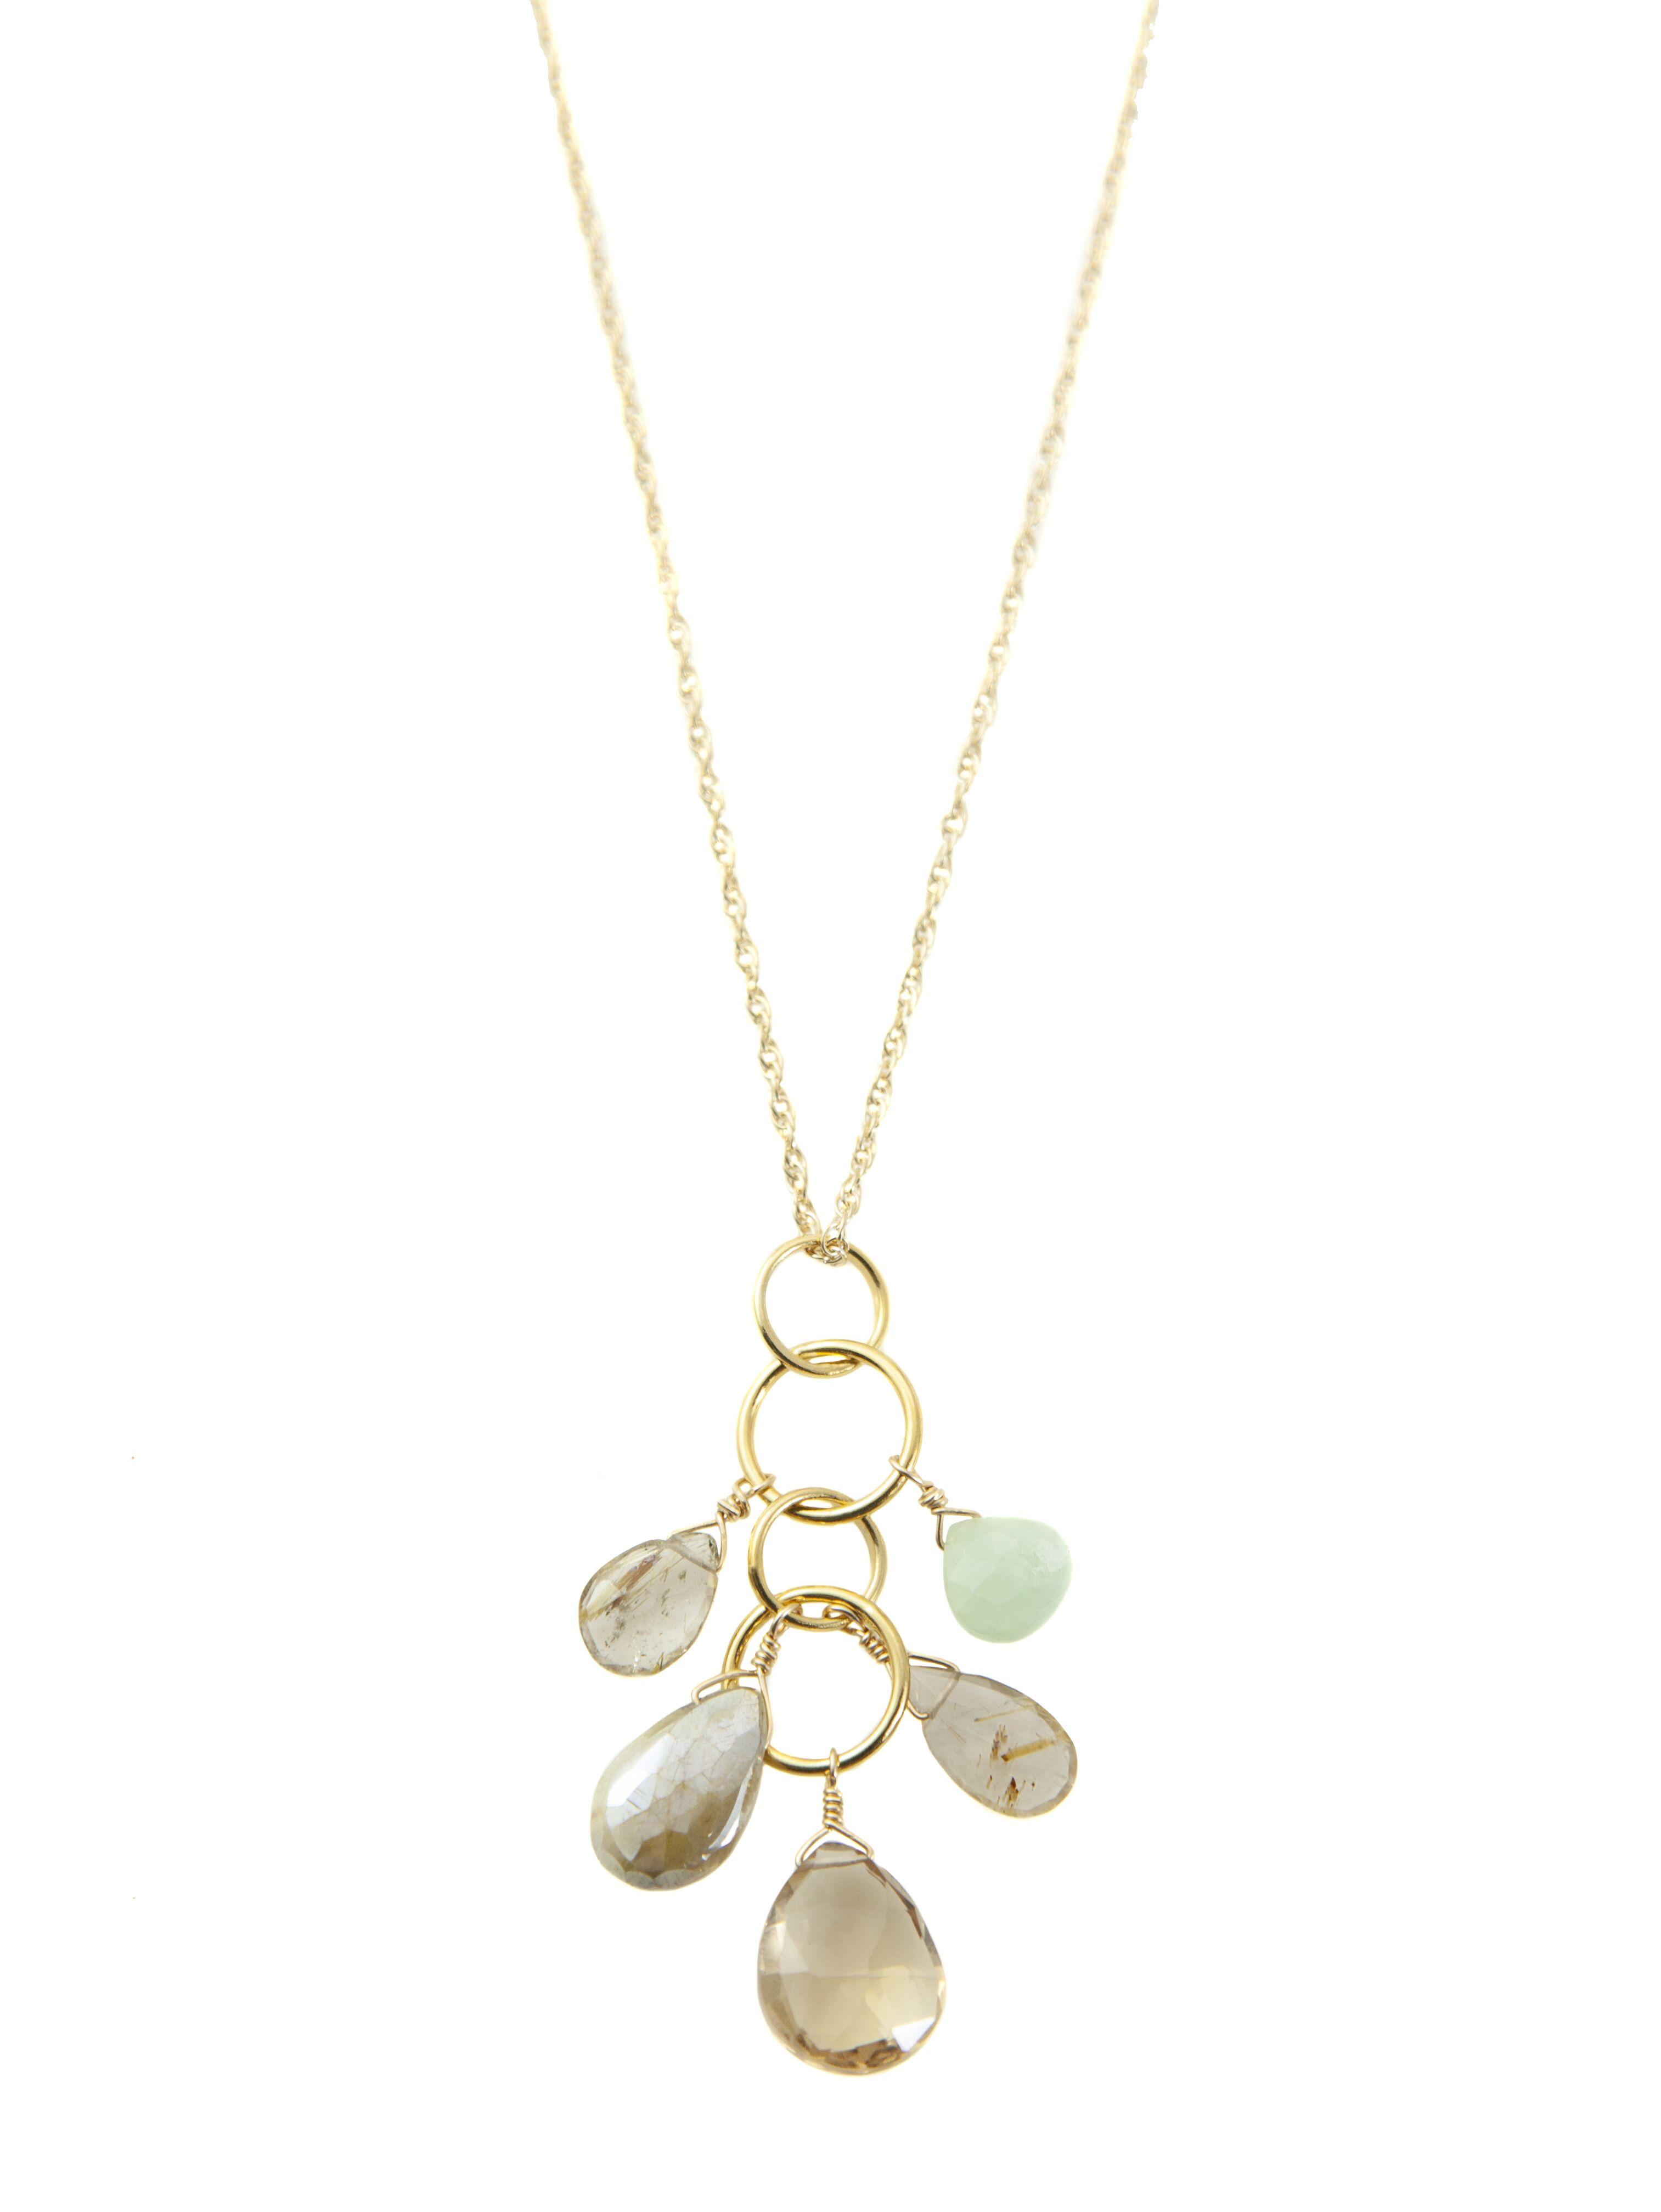 Aqua & Quartz Vermeil Necklace